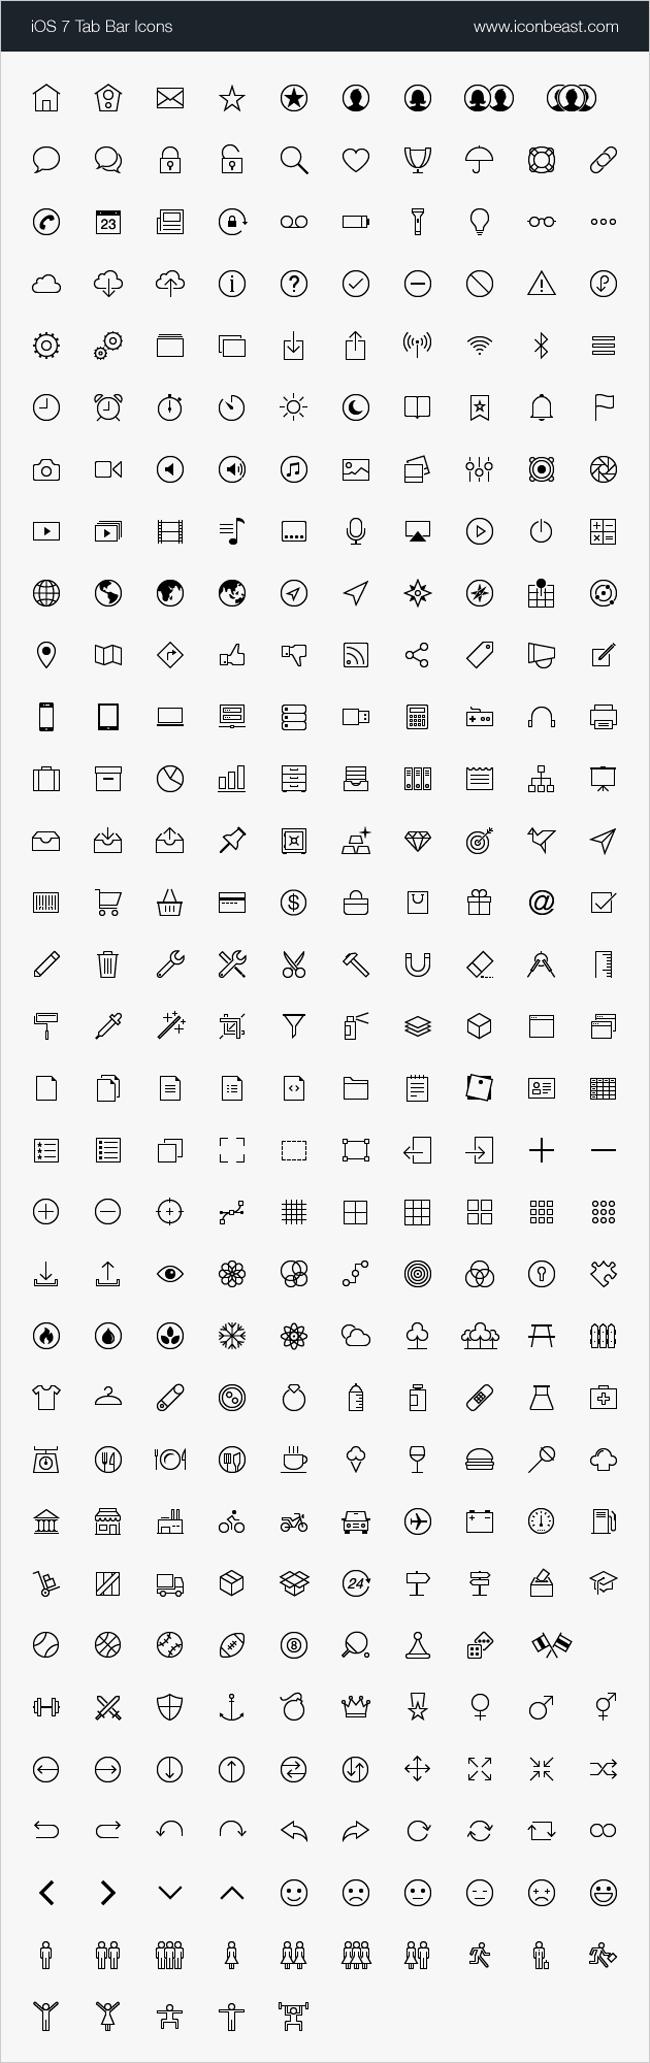 2,000+ High-Quality, iOS Tab Bar and Toolbar Icons